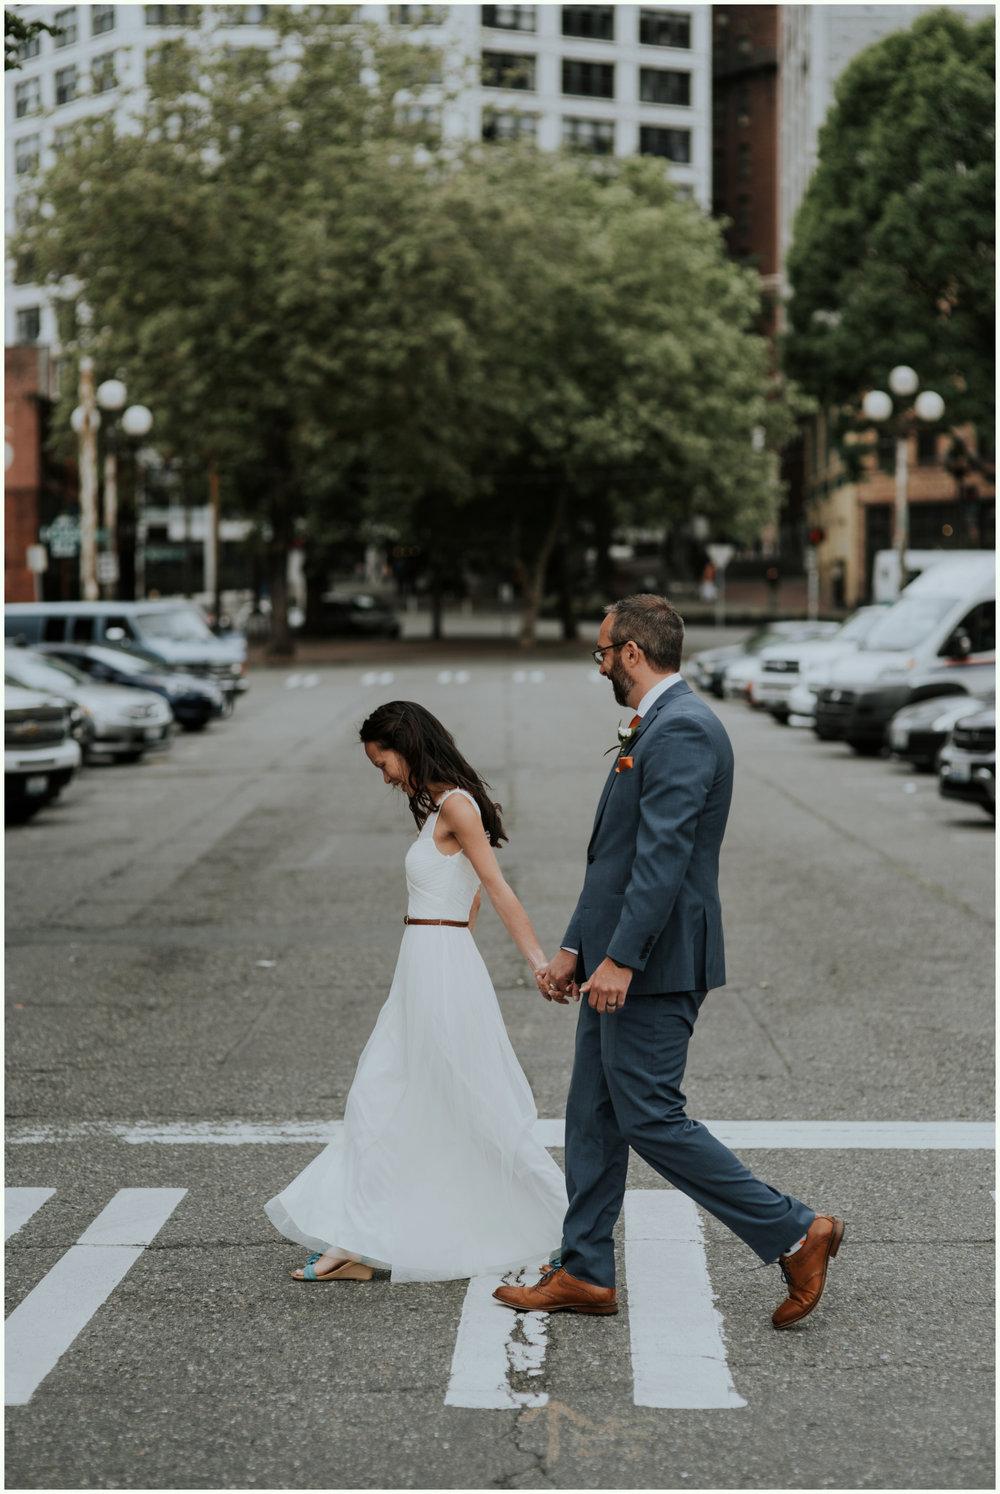 within-sodo-june-wedding-seattle-photographer-caitlyn-nikula-42.jpg